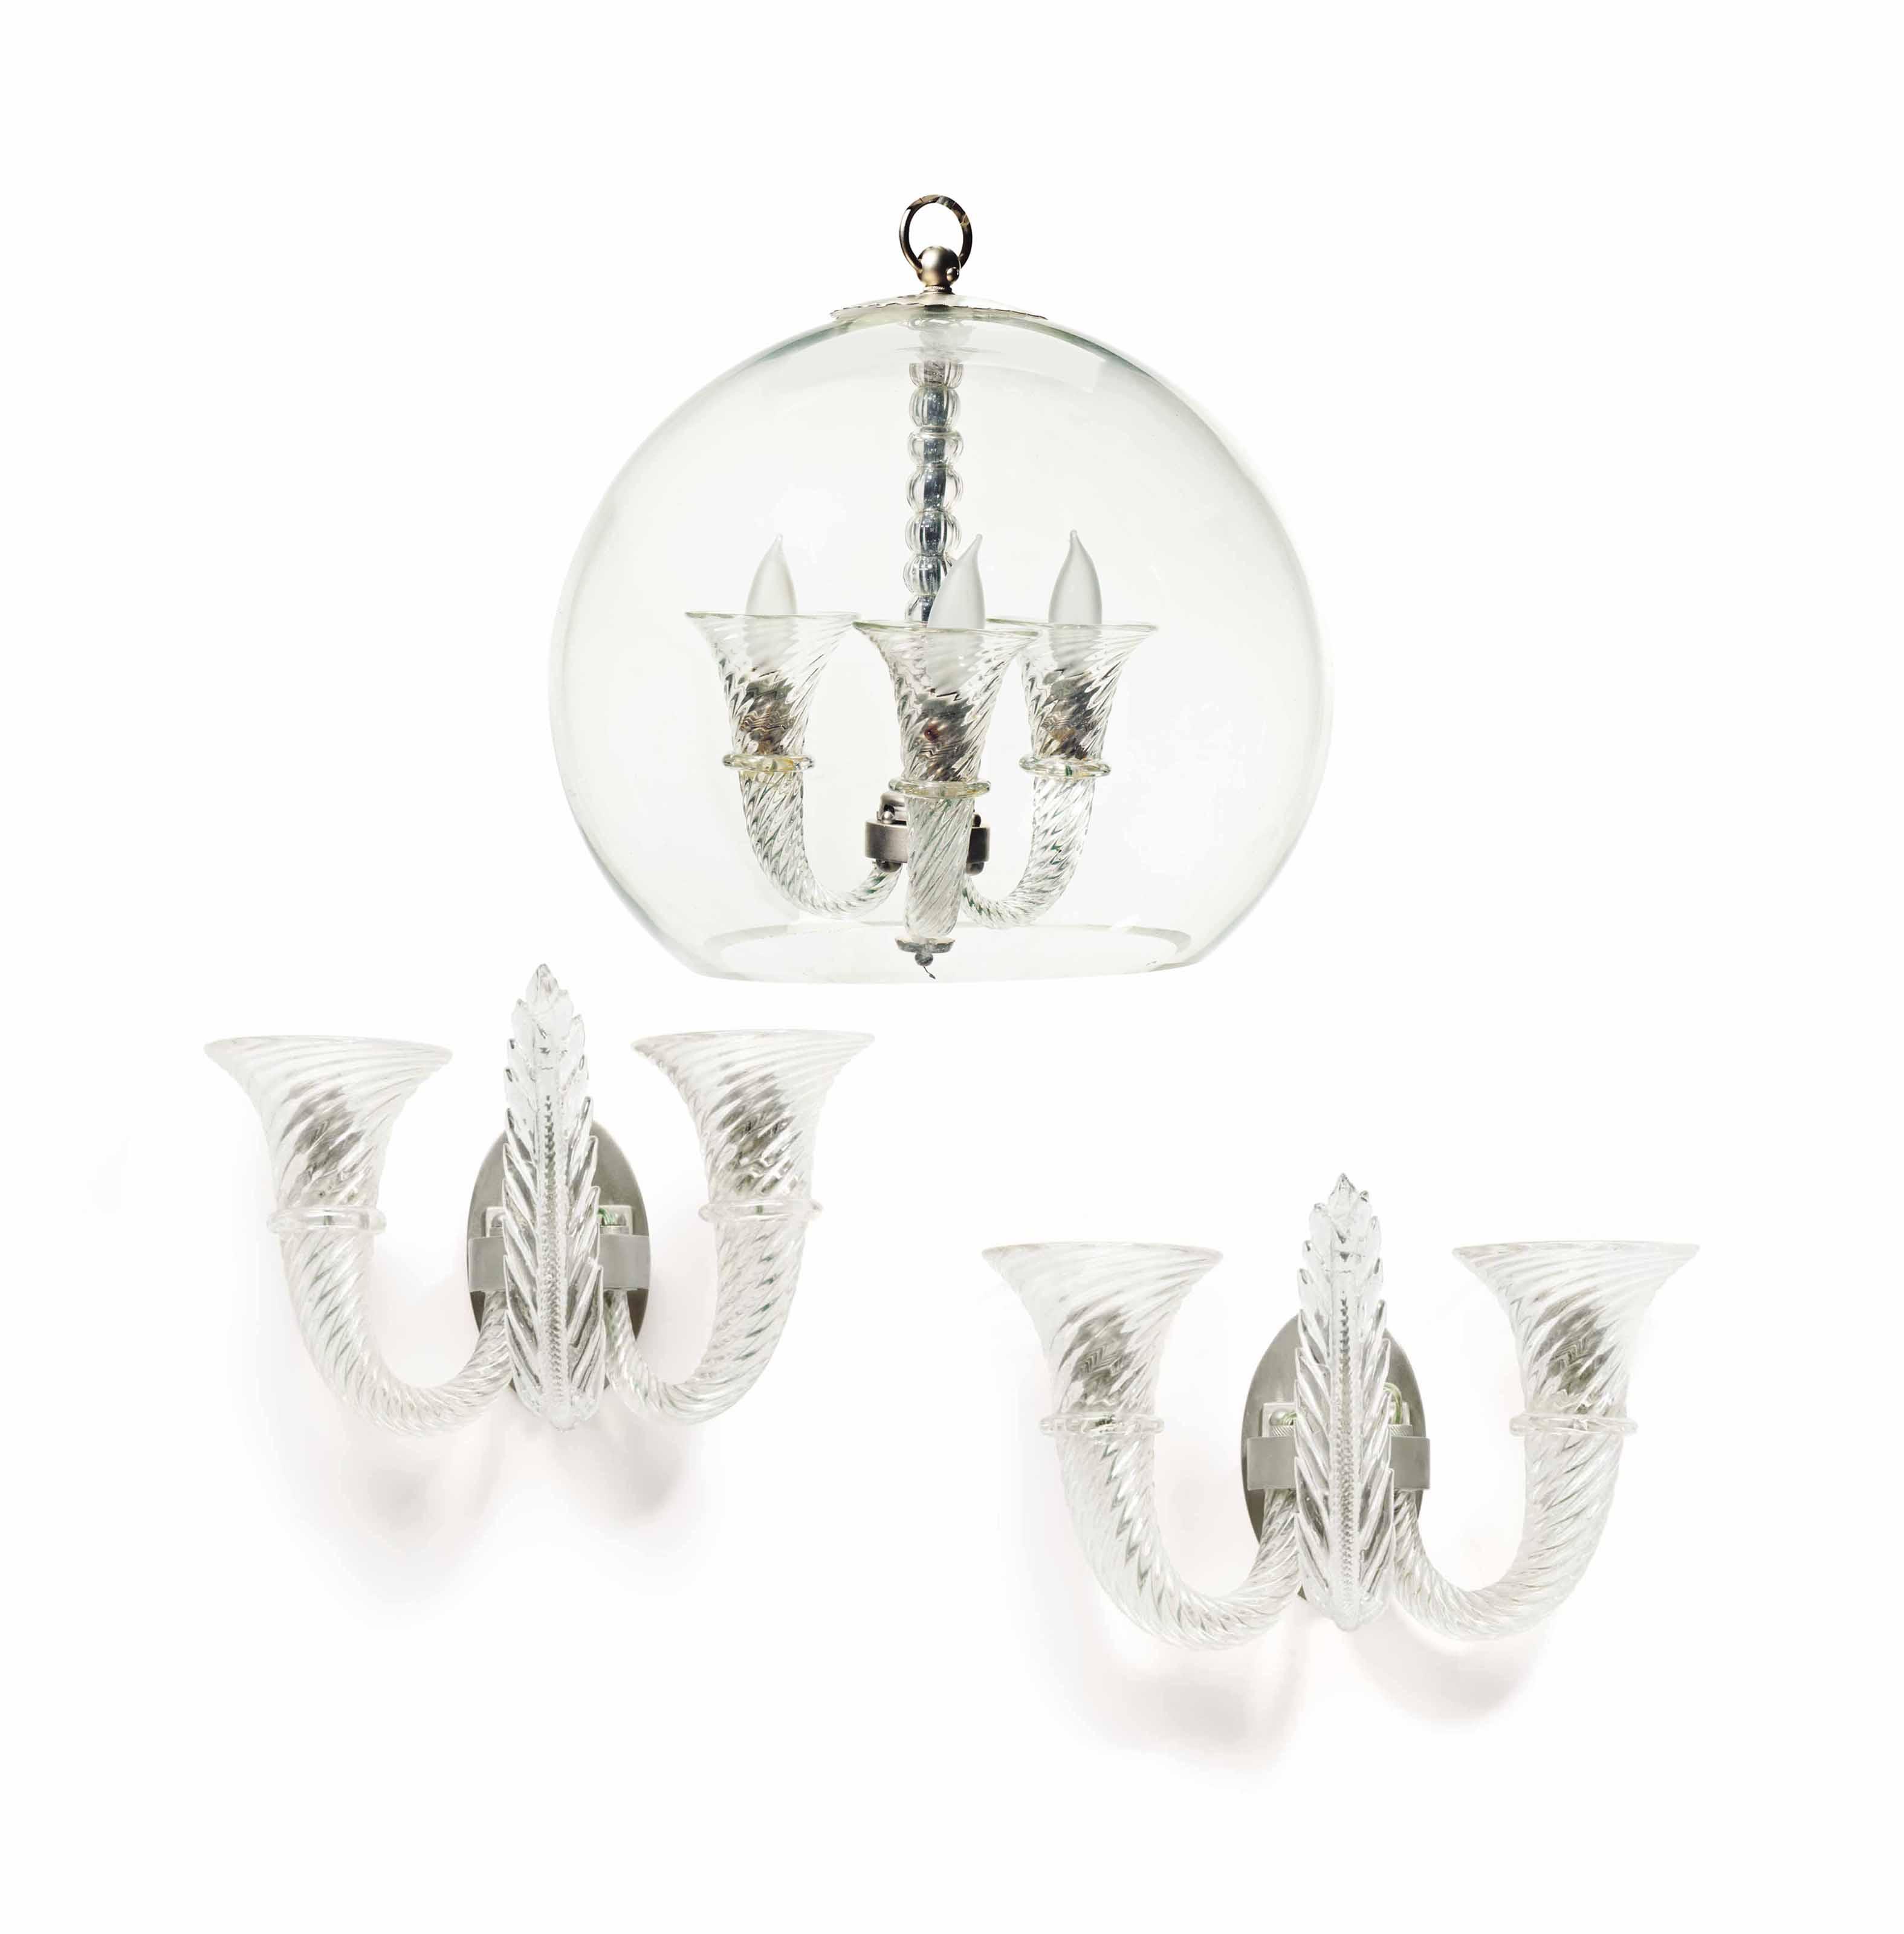 A FRENCH GLASS THREE-LIGHT CHA